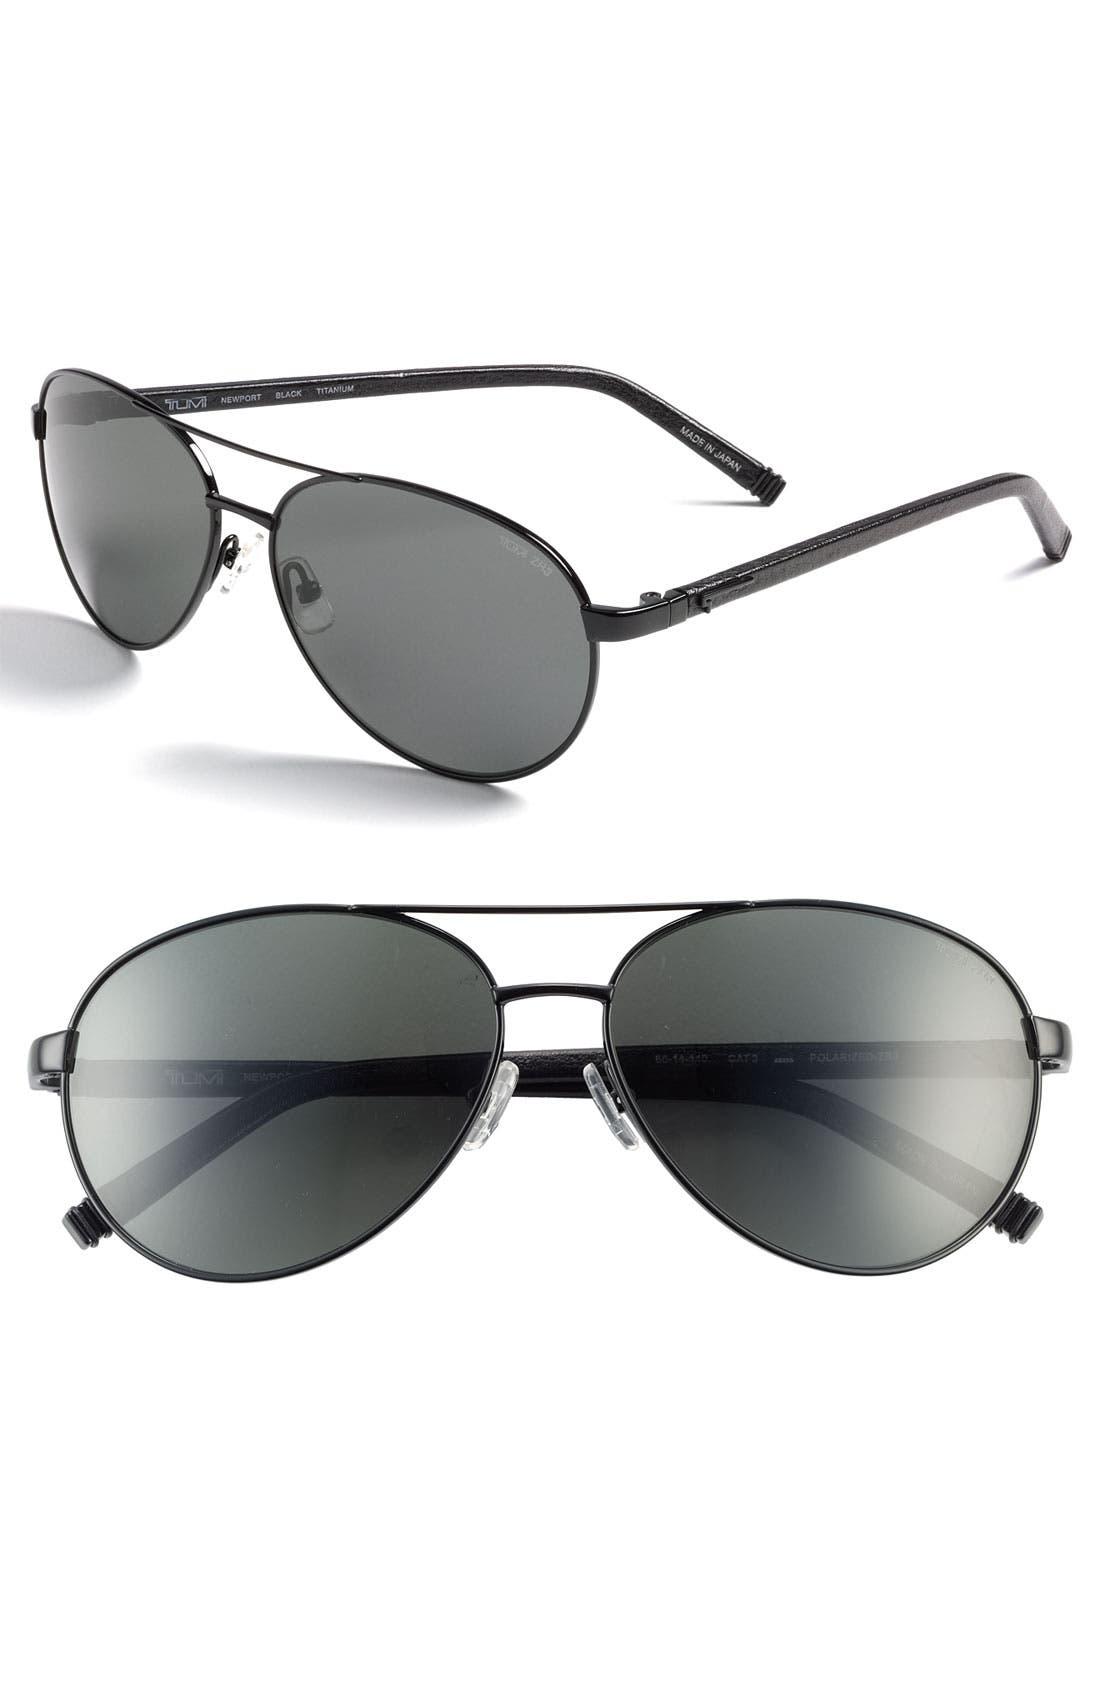 Main Image - Tumi 'Newport' Polarized Sunglasses